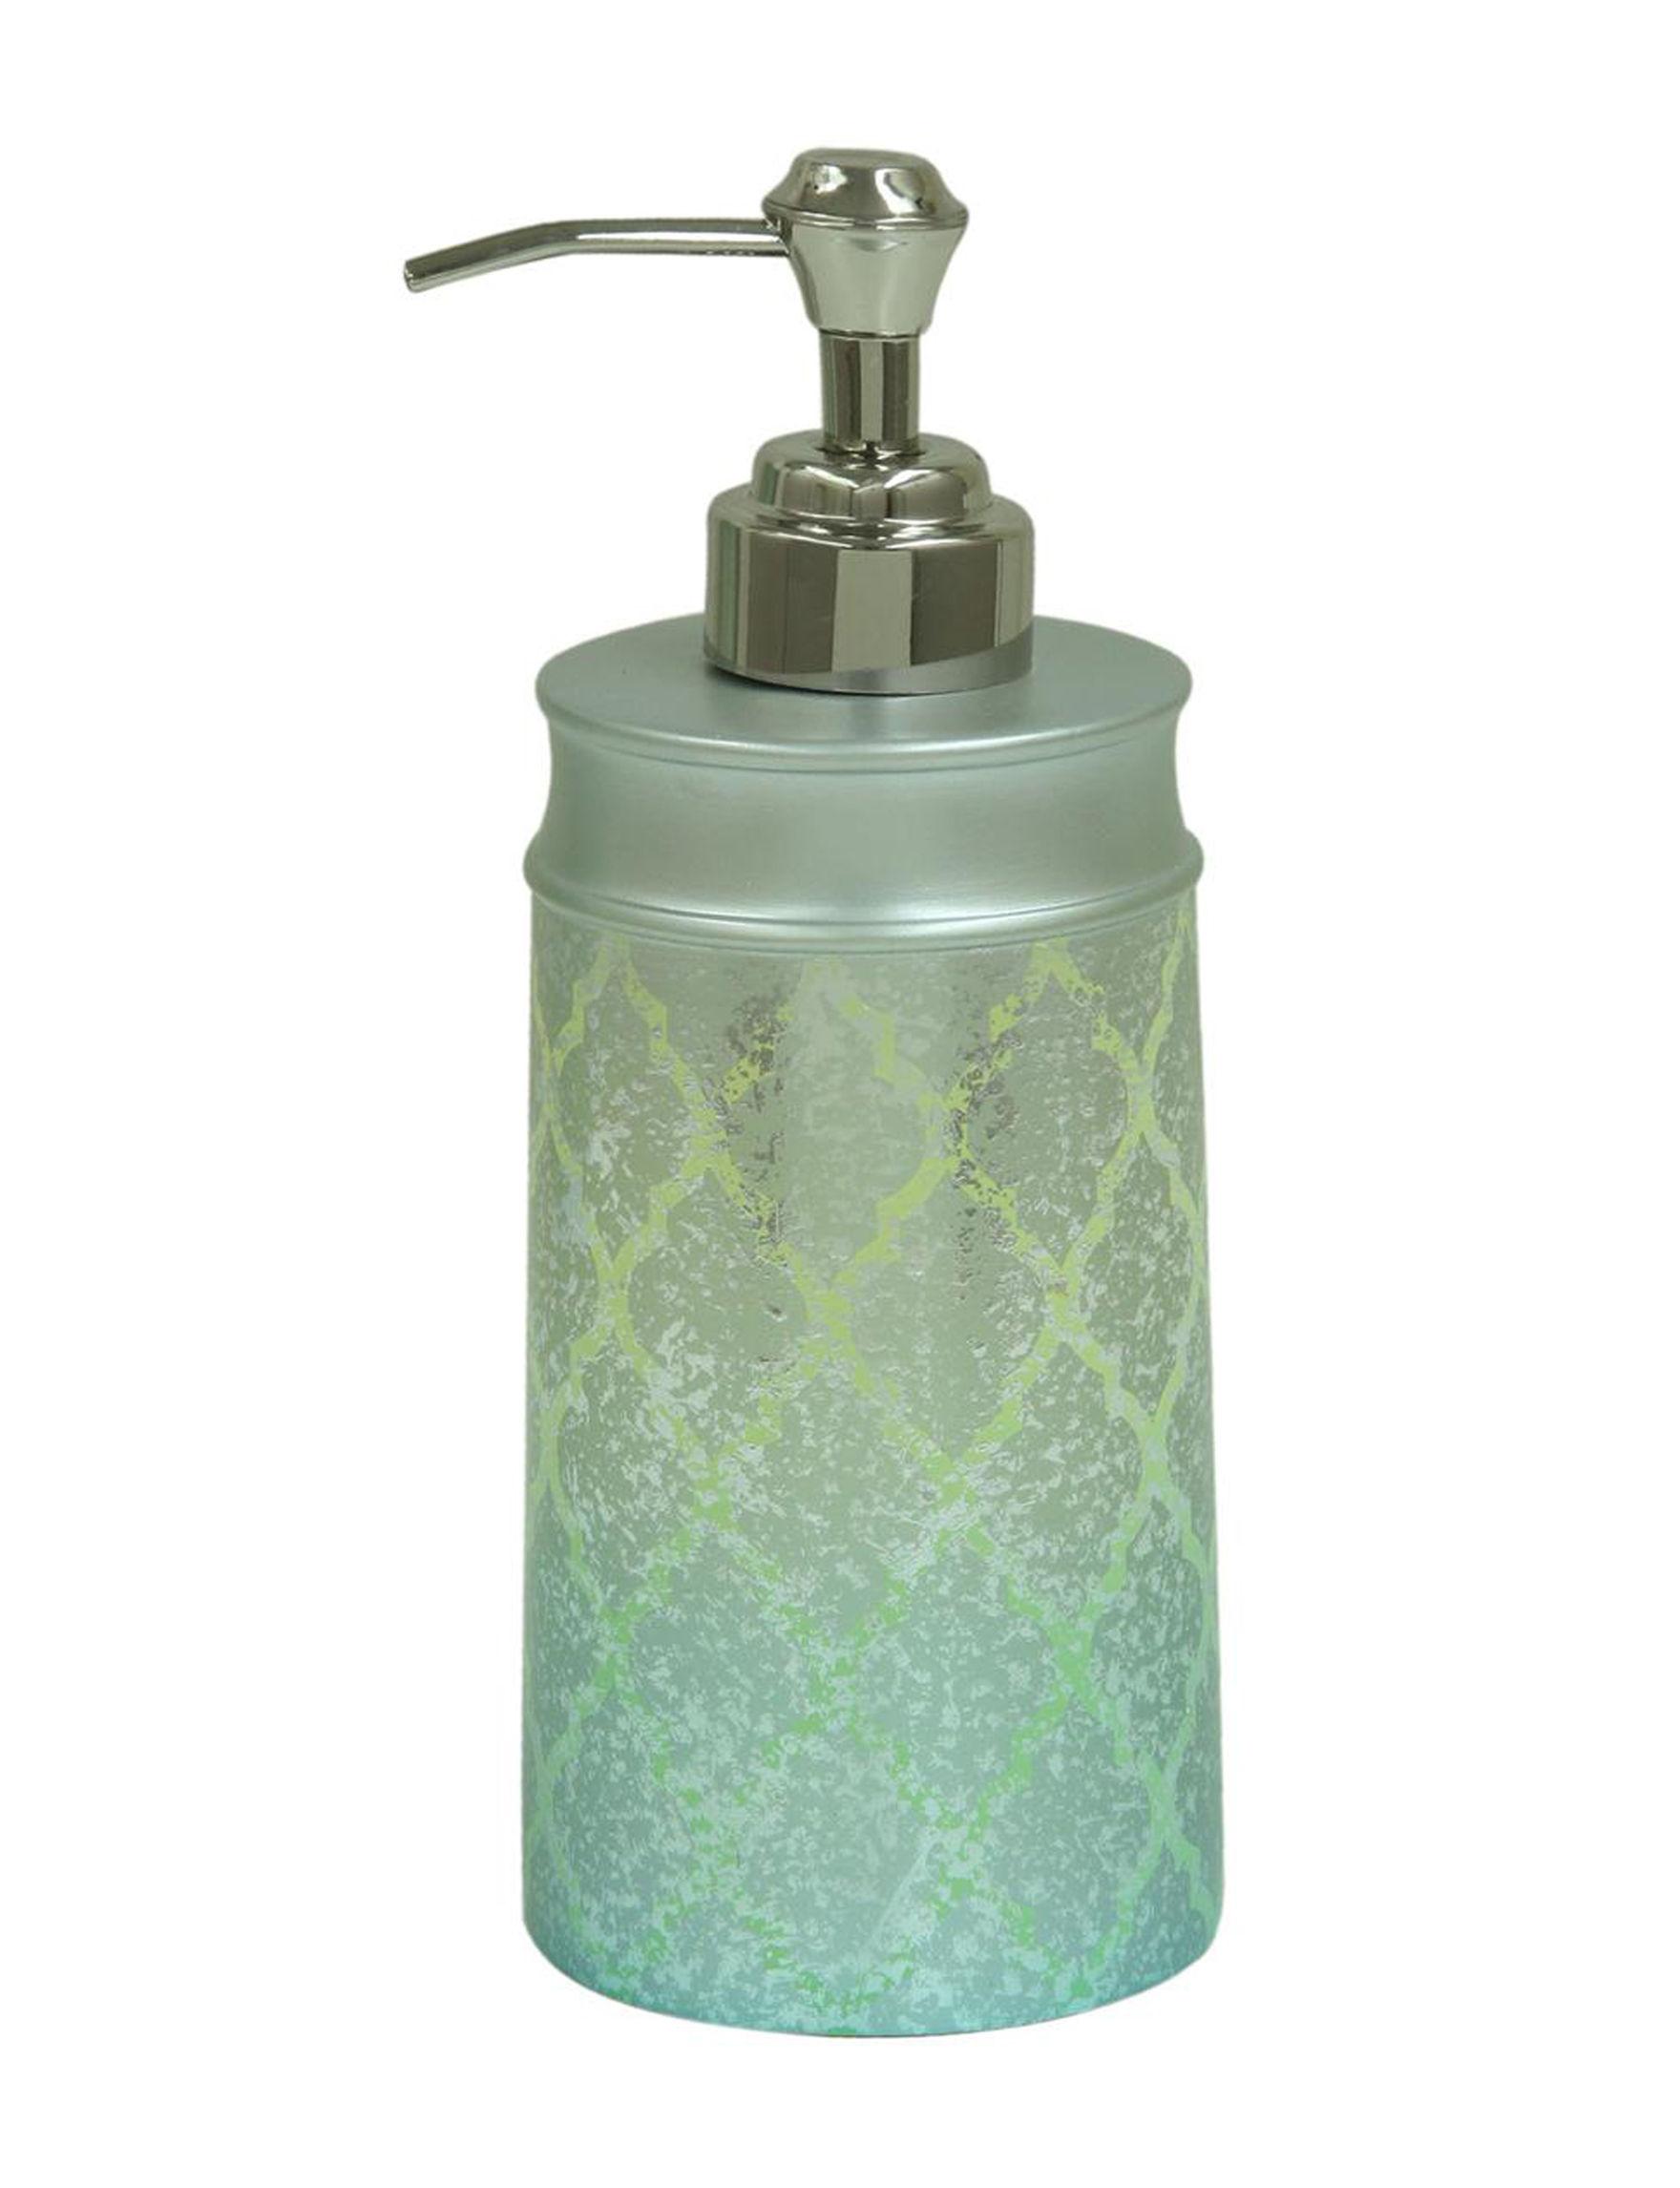 Bacova Guild Blue Soap & Lotion Dispensers Bath Accessories